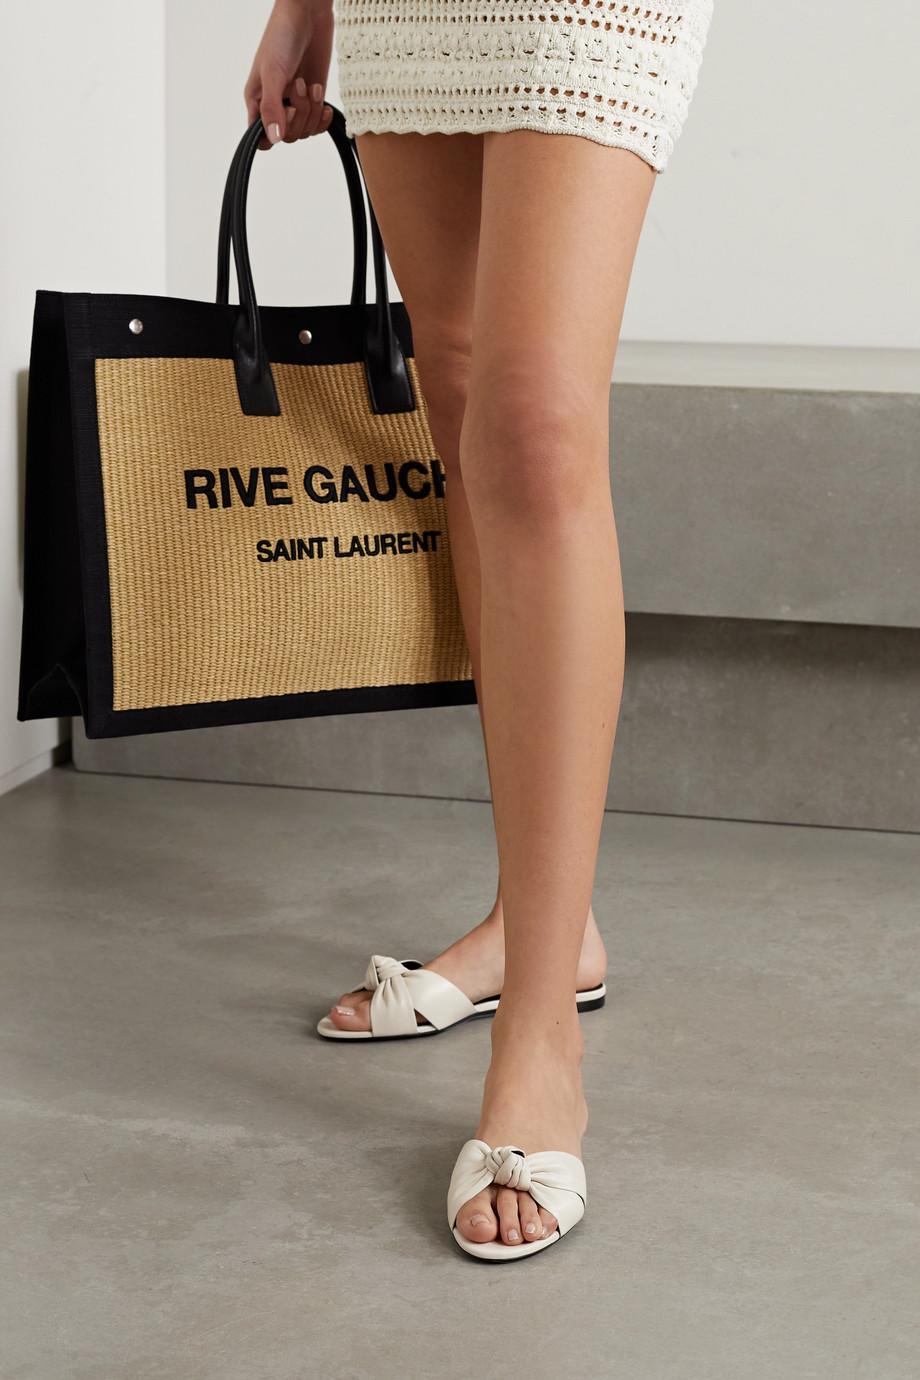 SAINT LAURENT Bianca knotted leather slides